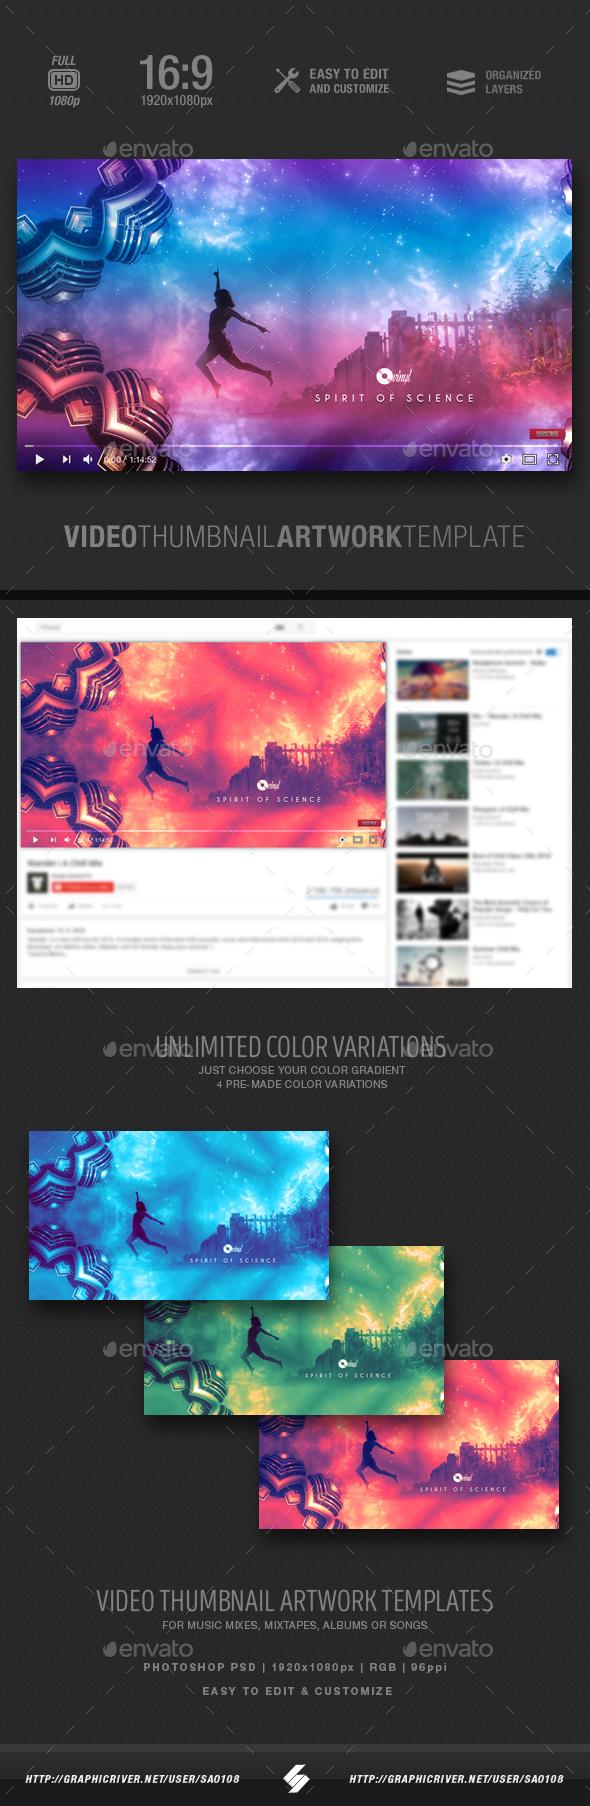 Spirit of Science - Video Thumbnail Artwork Template - YouTube Social Media